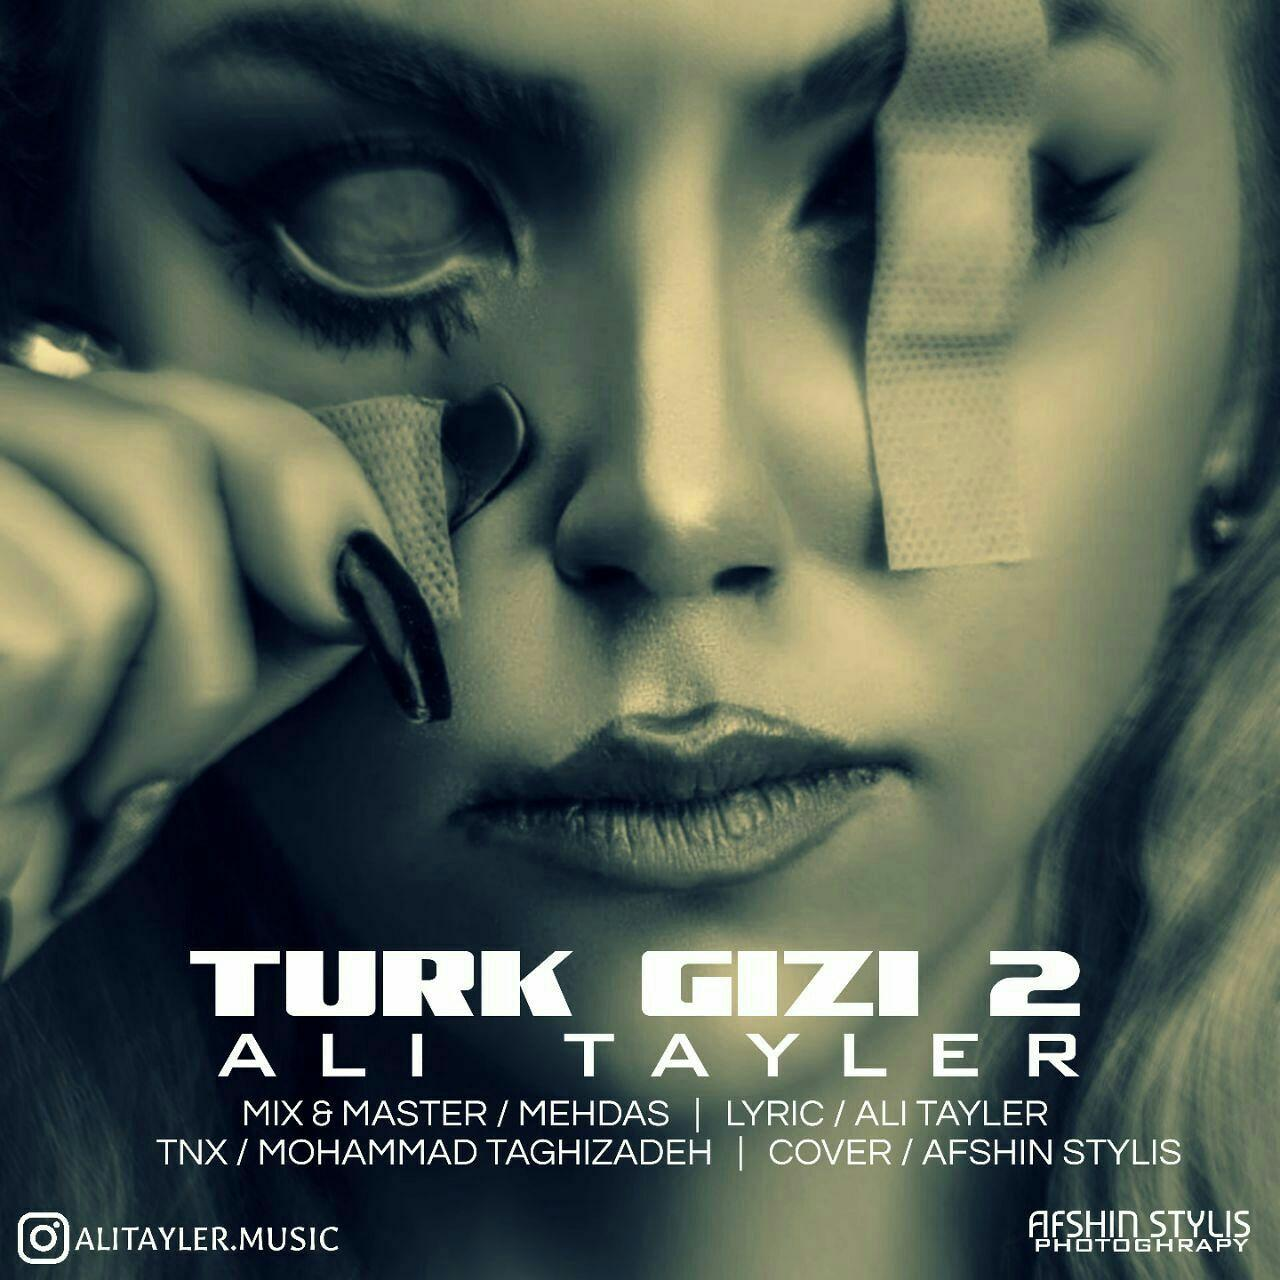 http://s7.picofile.com/file/8392391518/01Ali_Tayler_Turk_Gizi_2.jpg